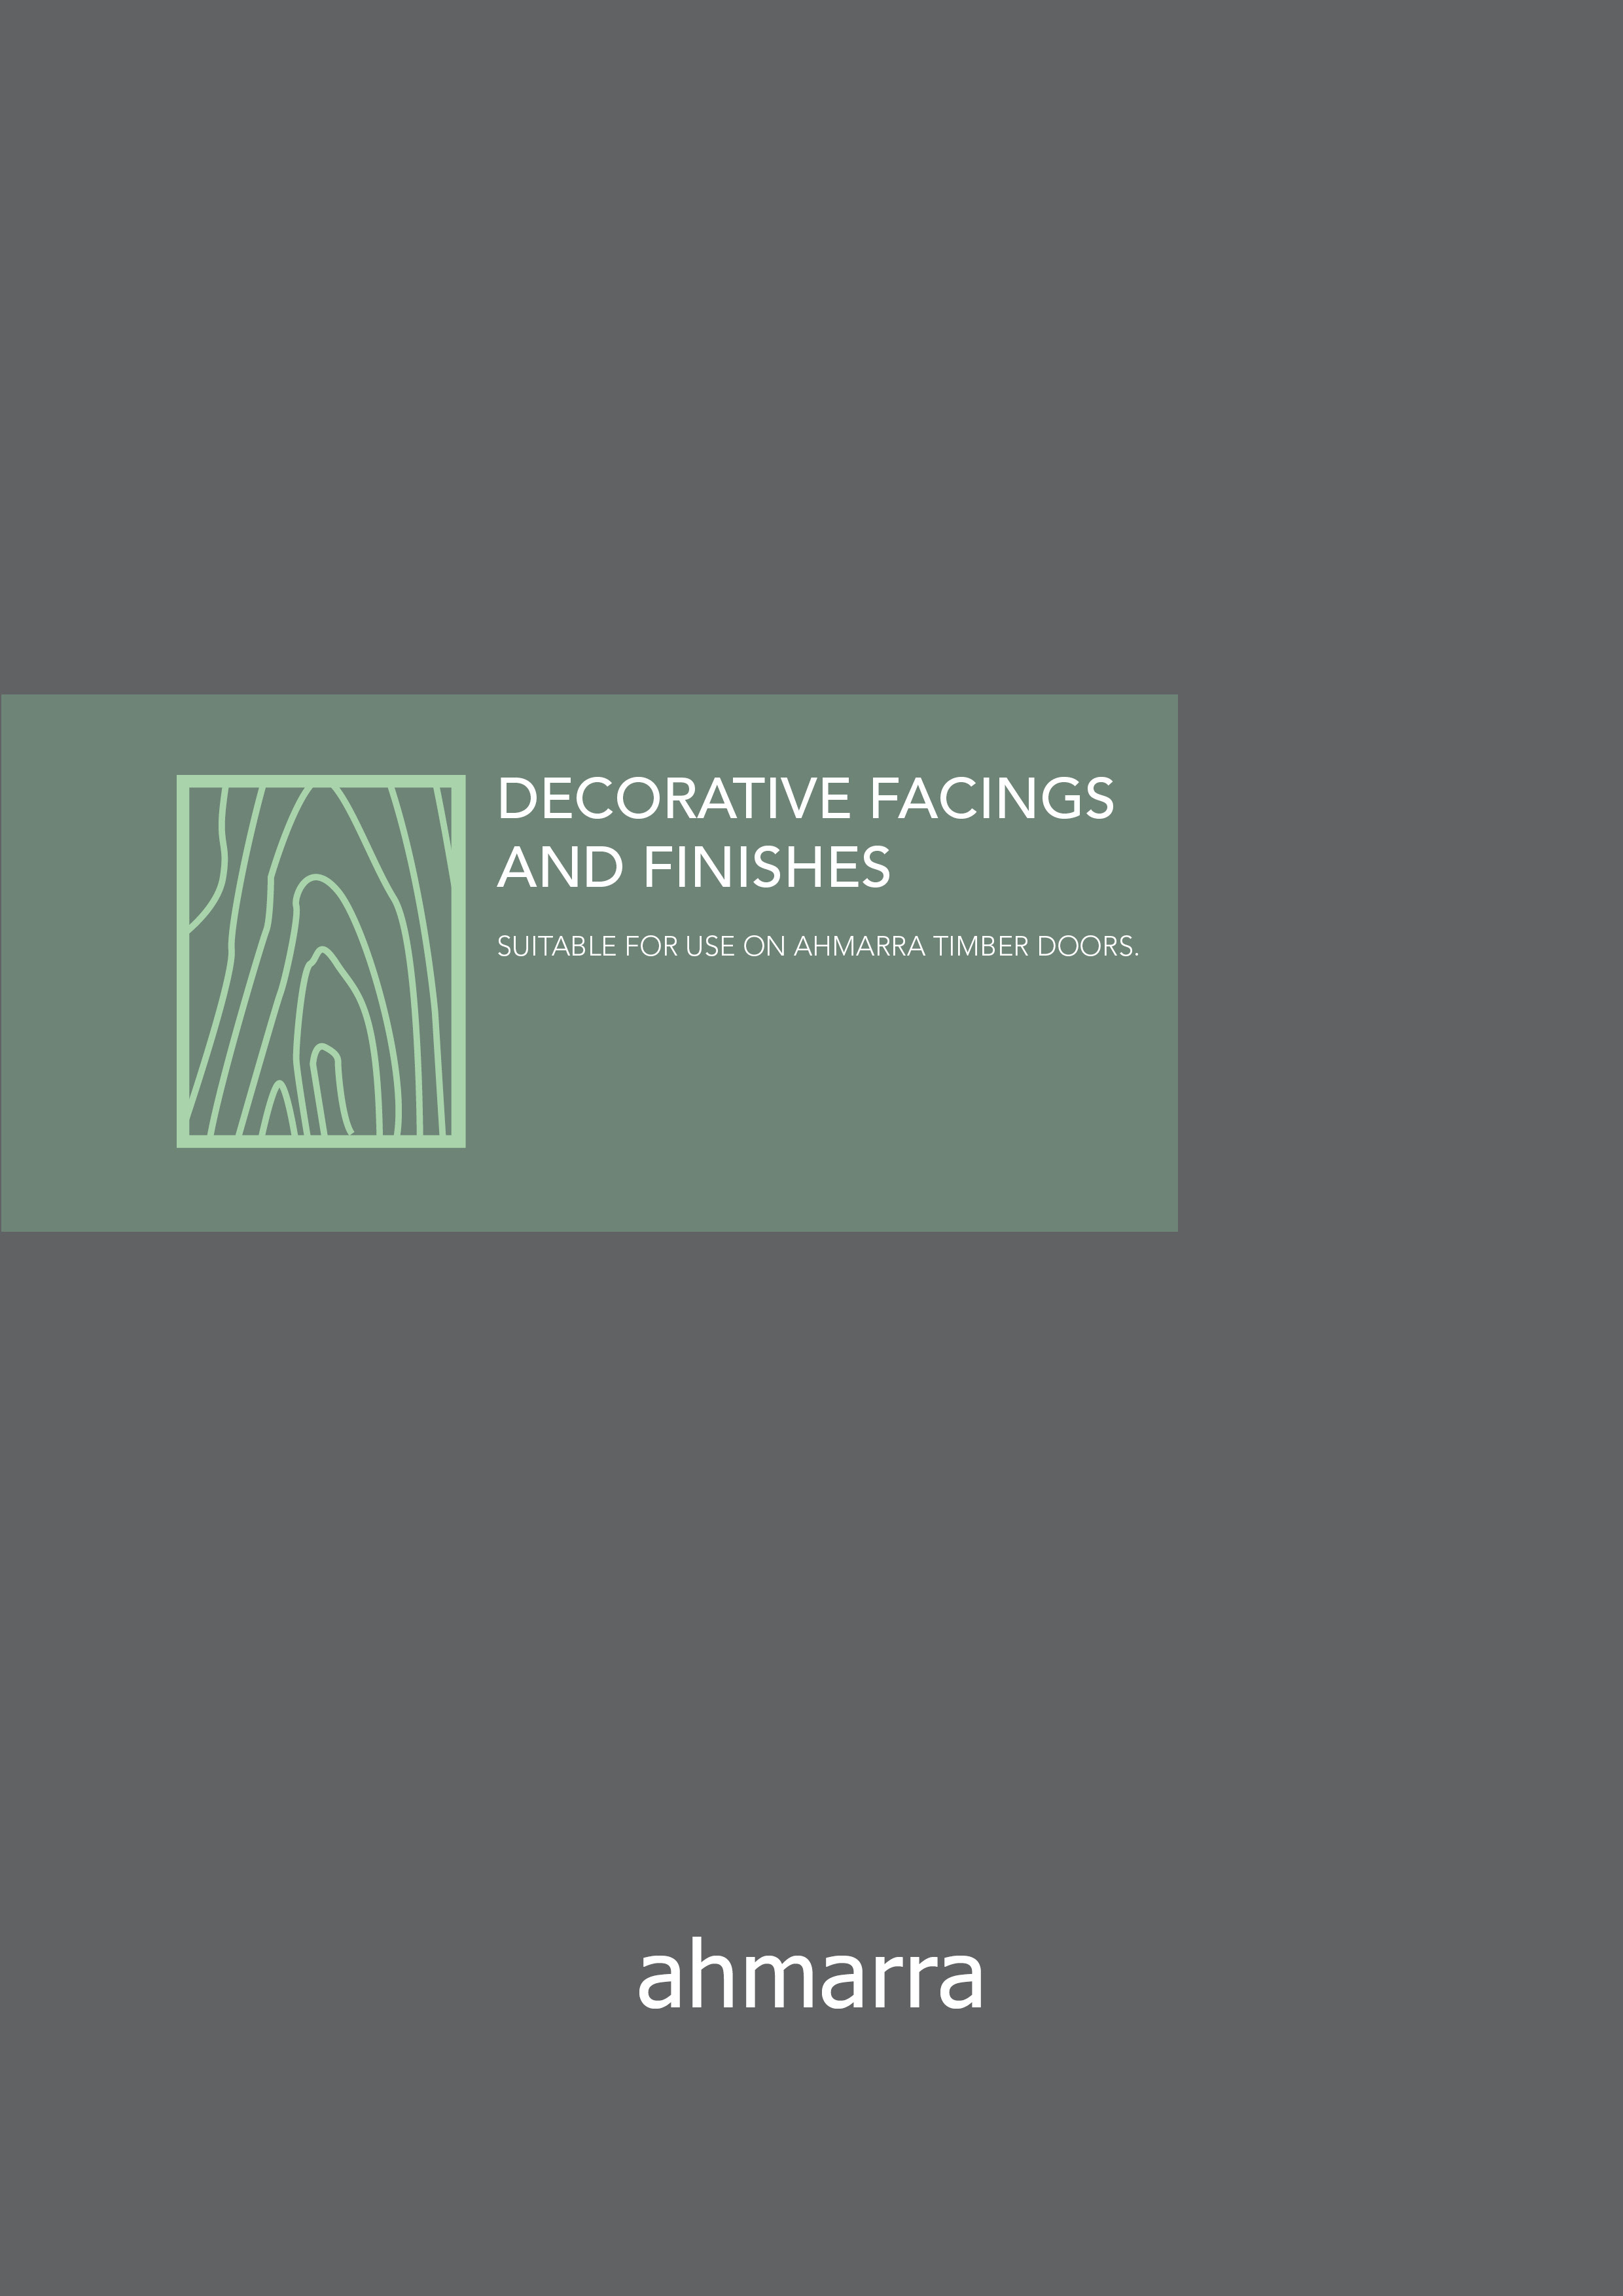 Decorative Facings and Finishes Brochure | Ahmarra Door Solutions